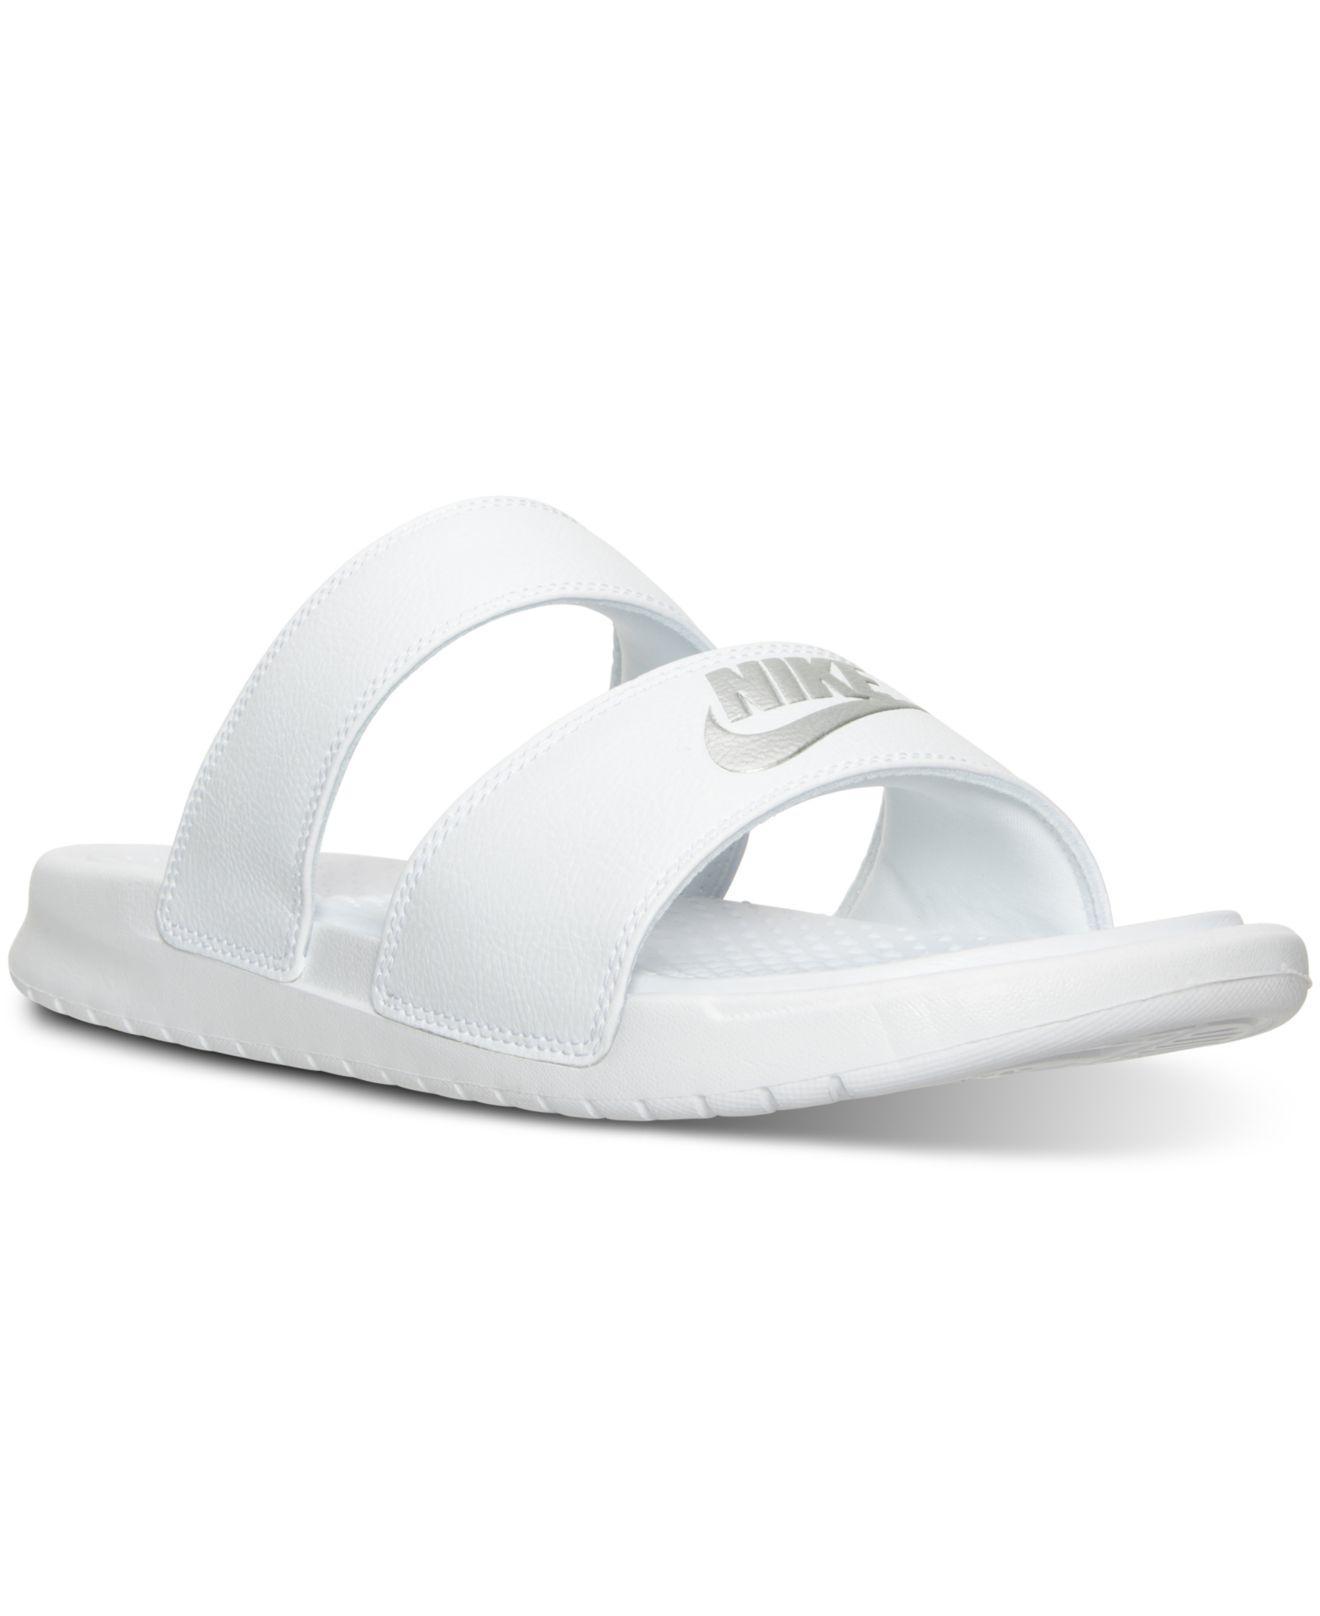 3d7214161 Lyst - Nike Women s Benassi Duo Ultra Slide Sandals From Finish Line ...